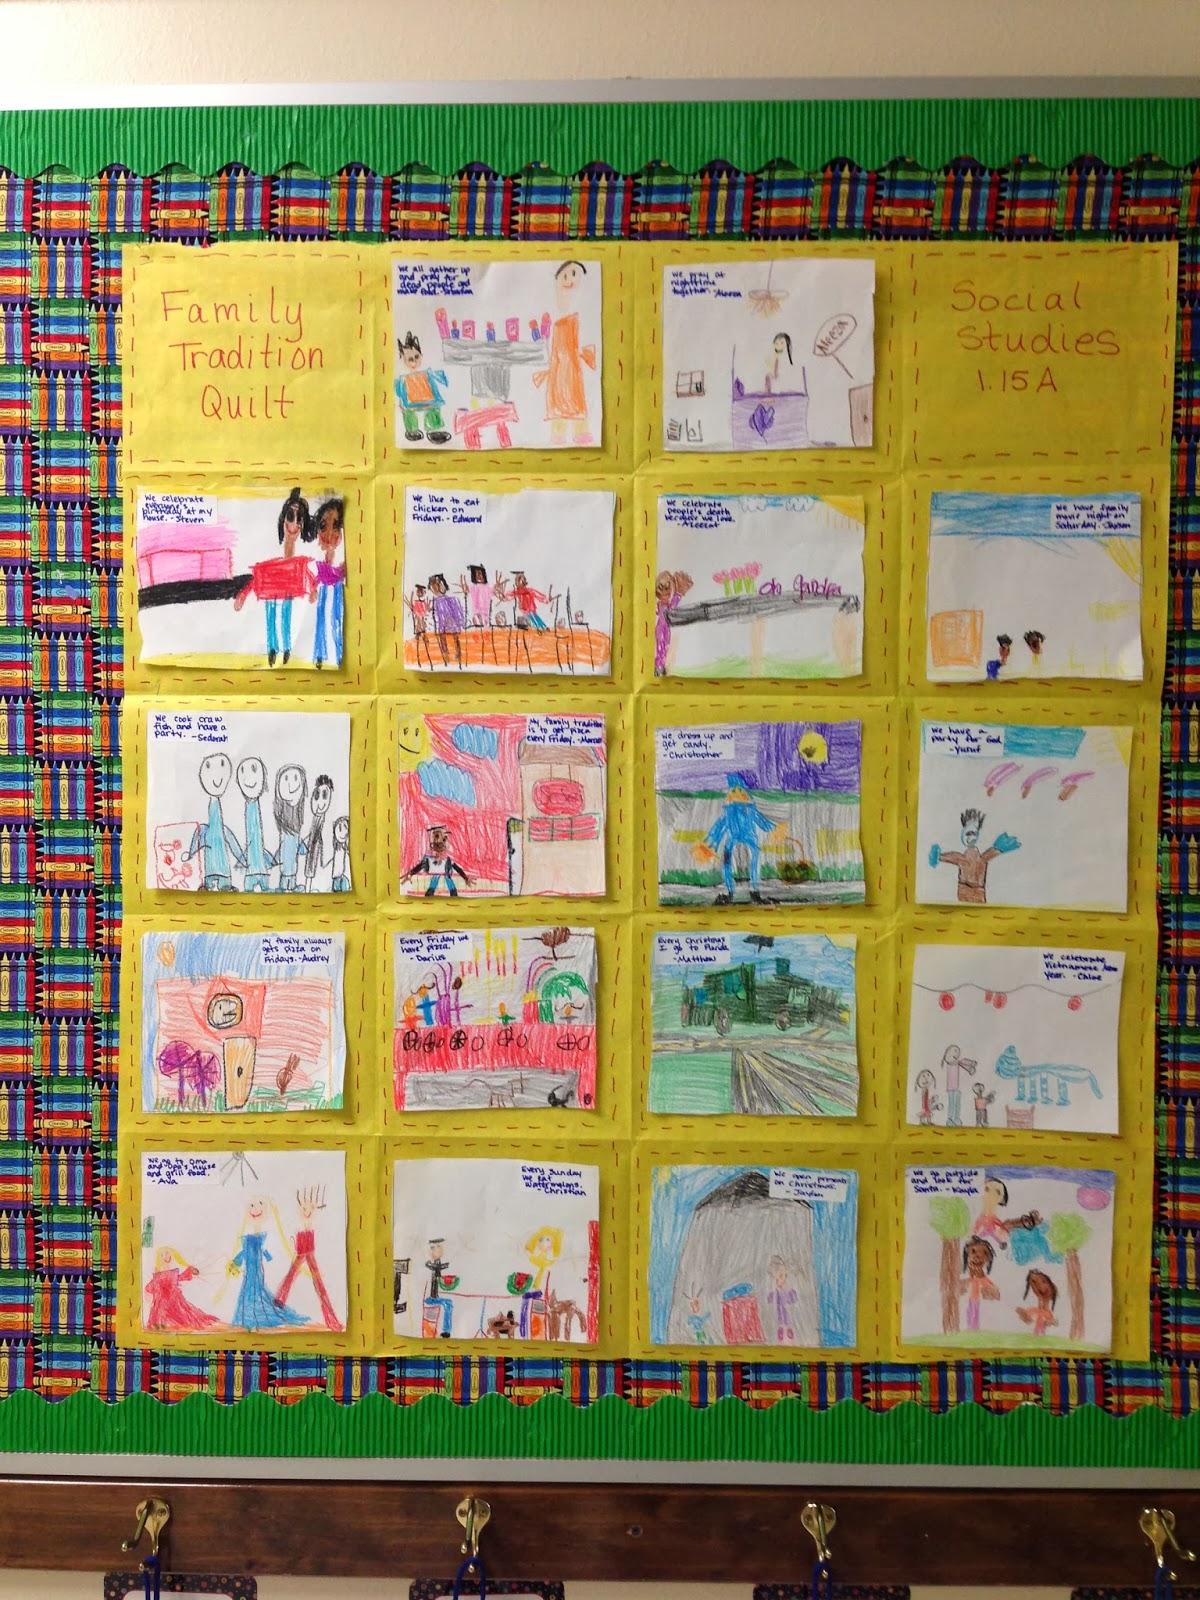 Bishop S Blackboard An Elementary Education Blog Family